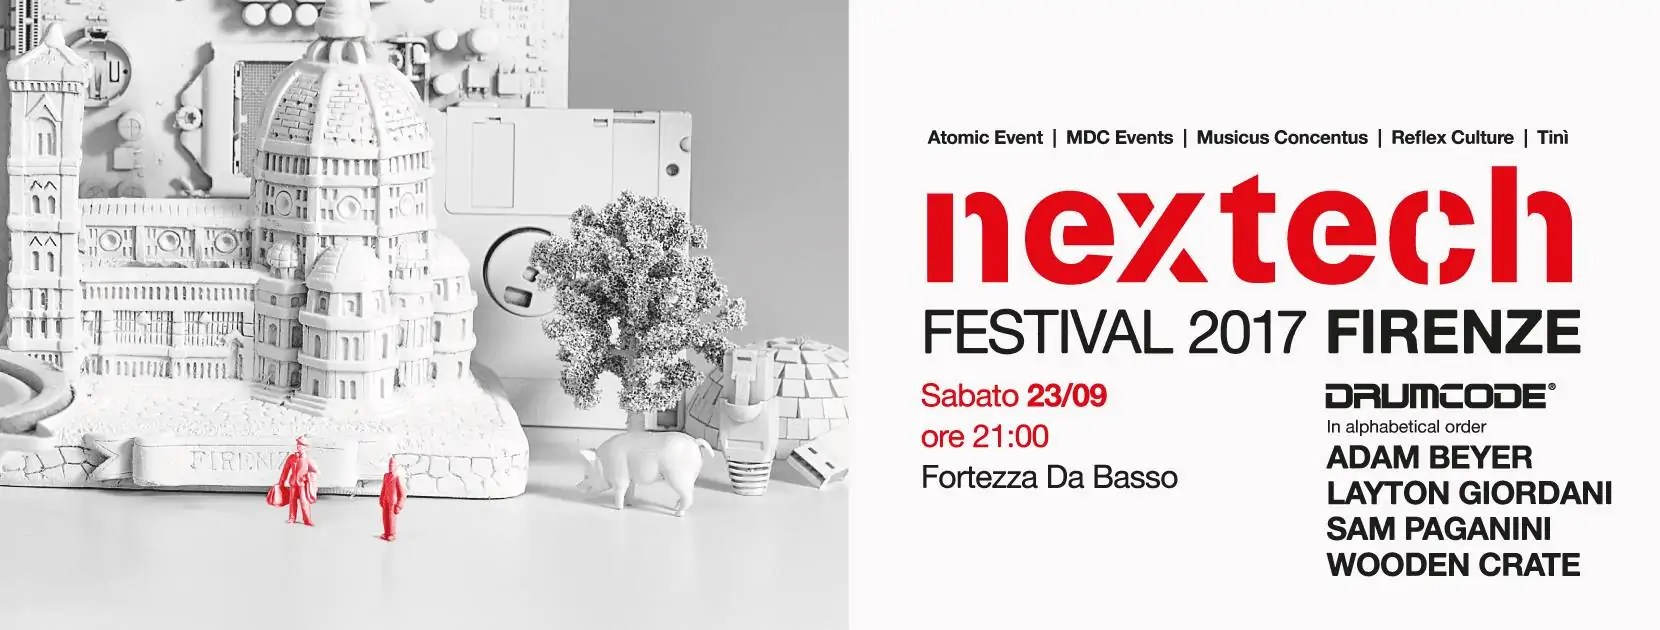 NEXTECH @Fortezza Da Basso Firenze 23 Settembre 2017 Drumcode Night Ticket + Hotel